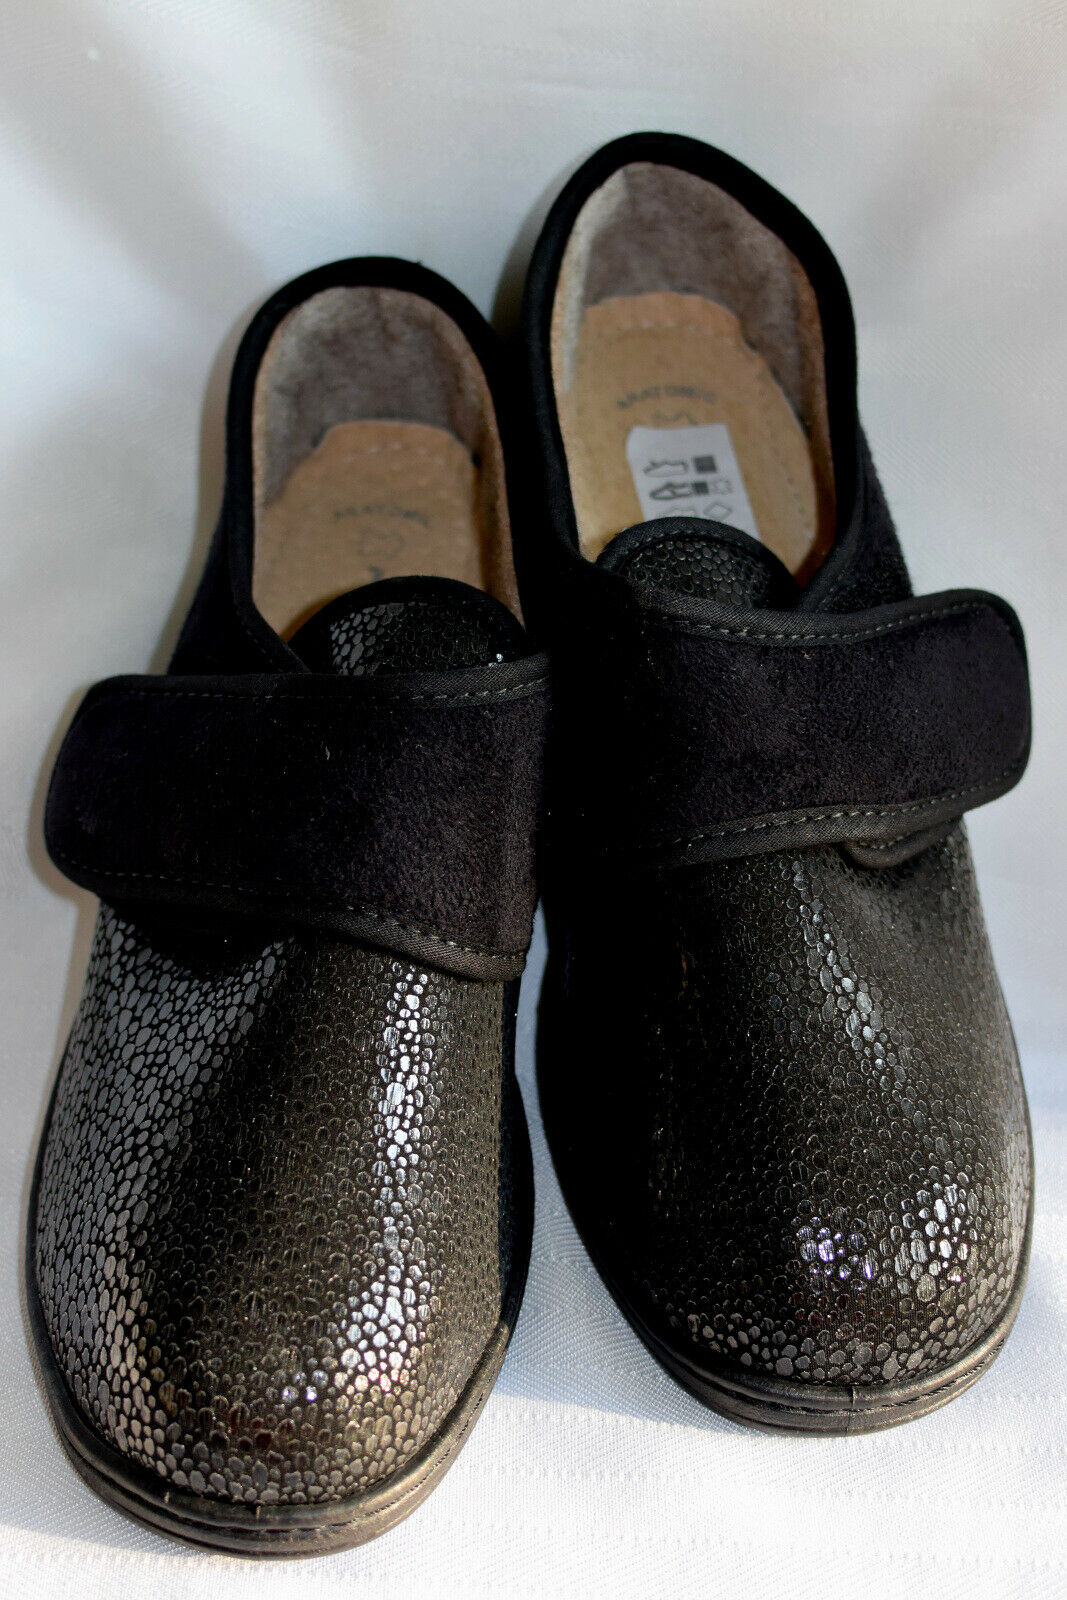 NWOB Black Janice Anatomic Flexus Spring Step Wedge Slipper Shoes-Italy Made-40